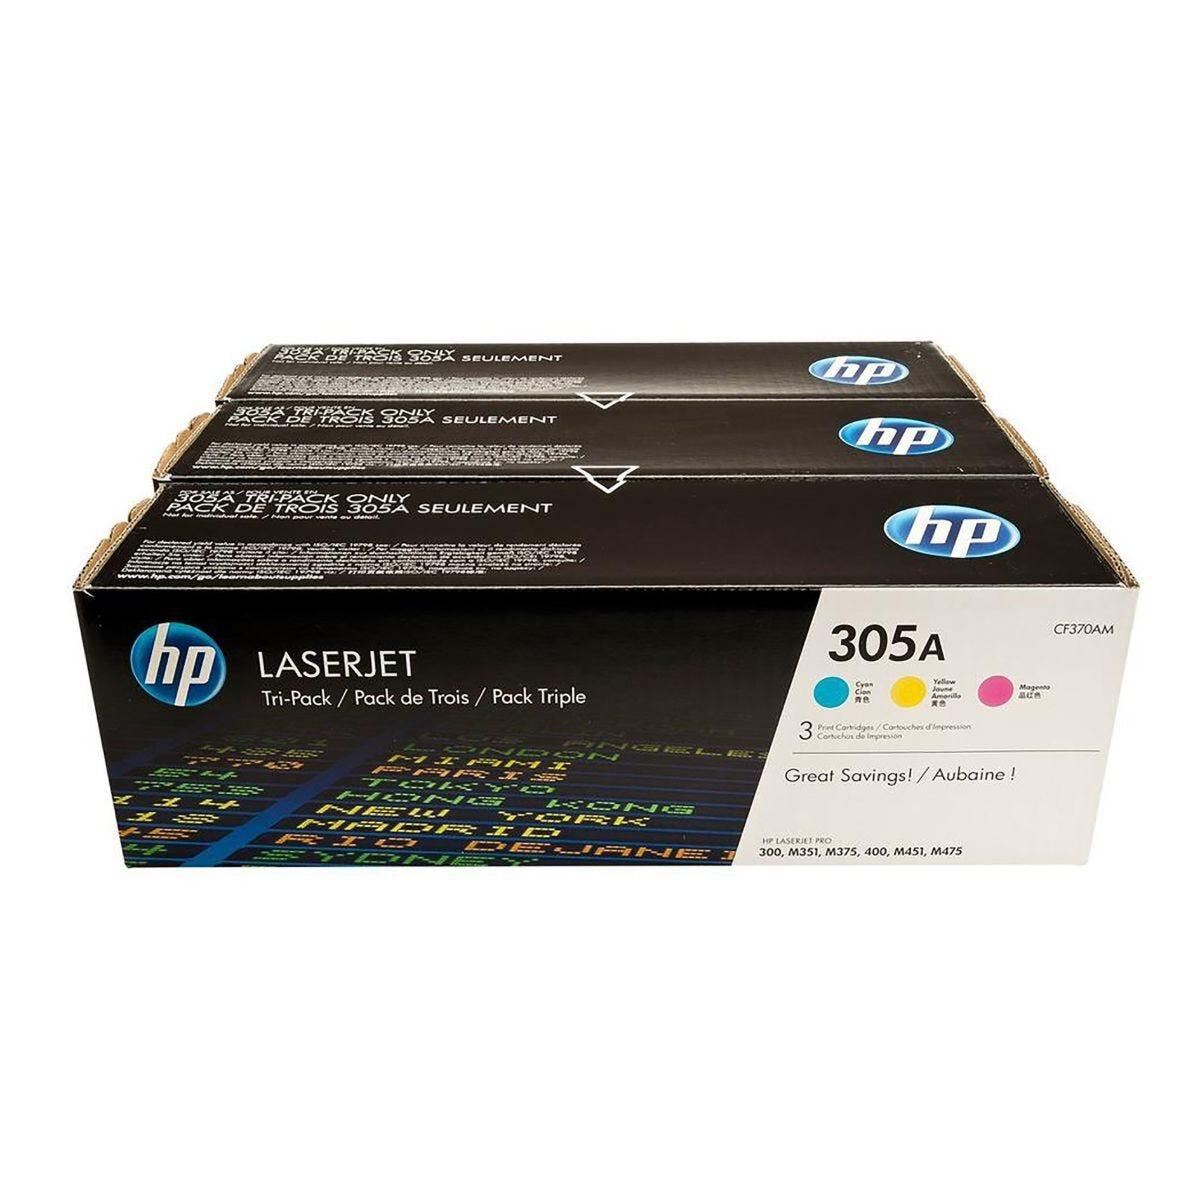 HP 305A Multi Pack Toner